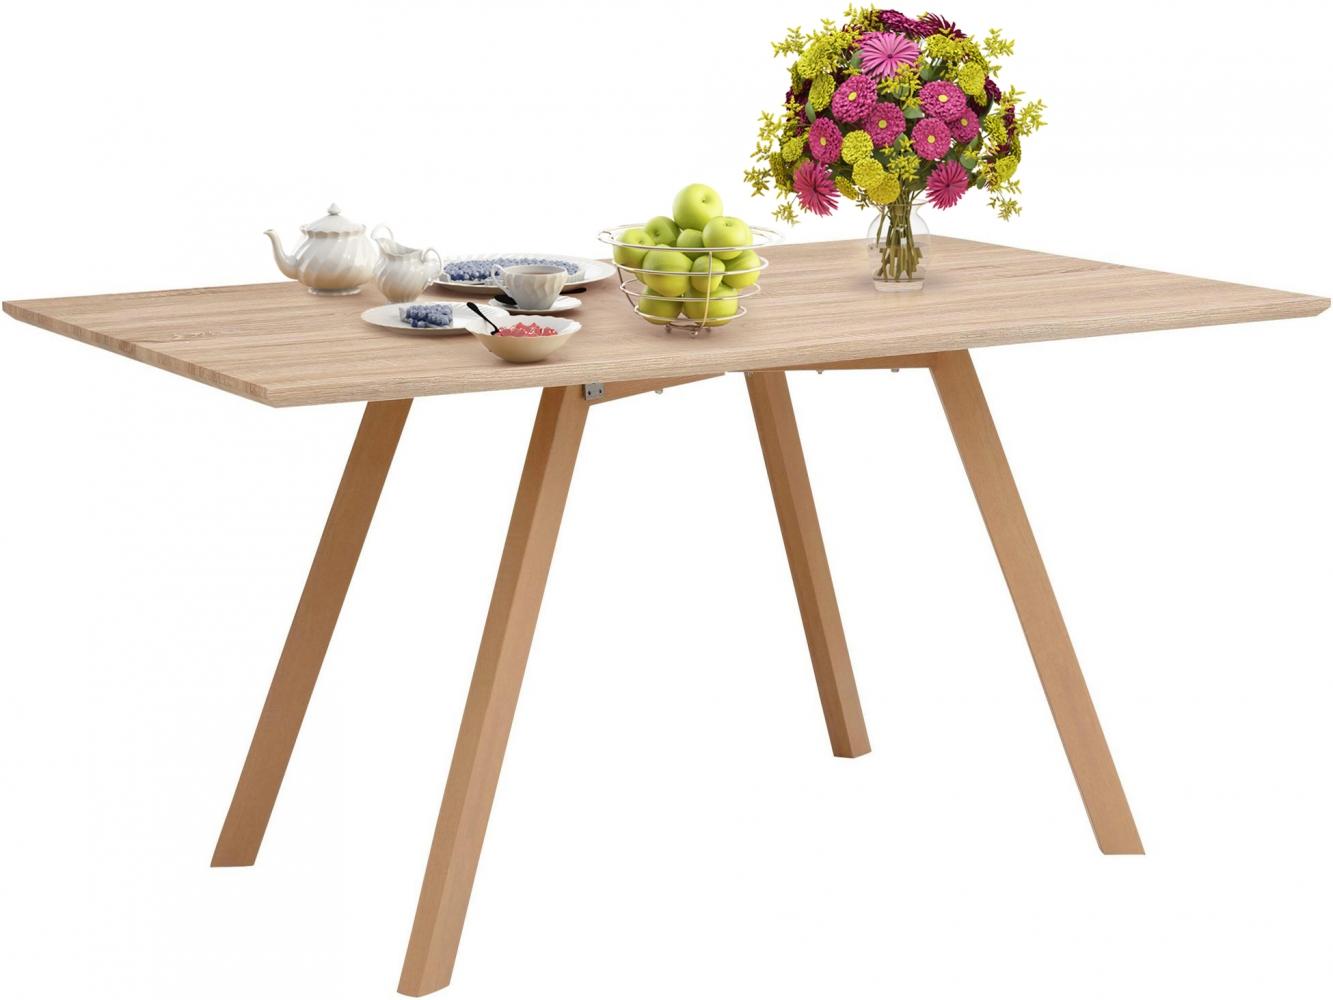 Jídelní stůl Alex, 120 cm, dub